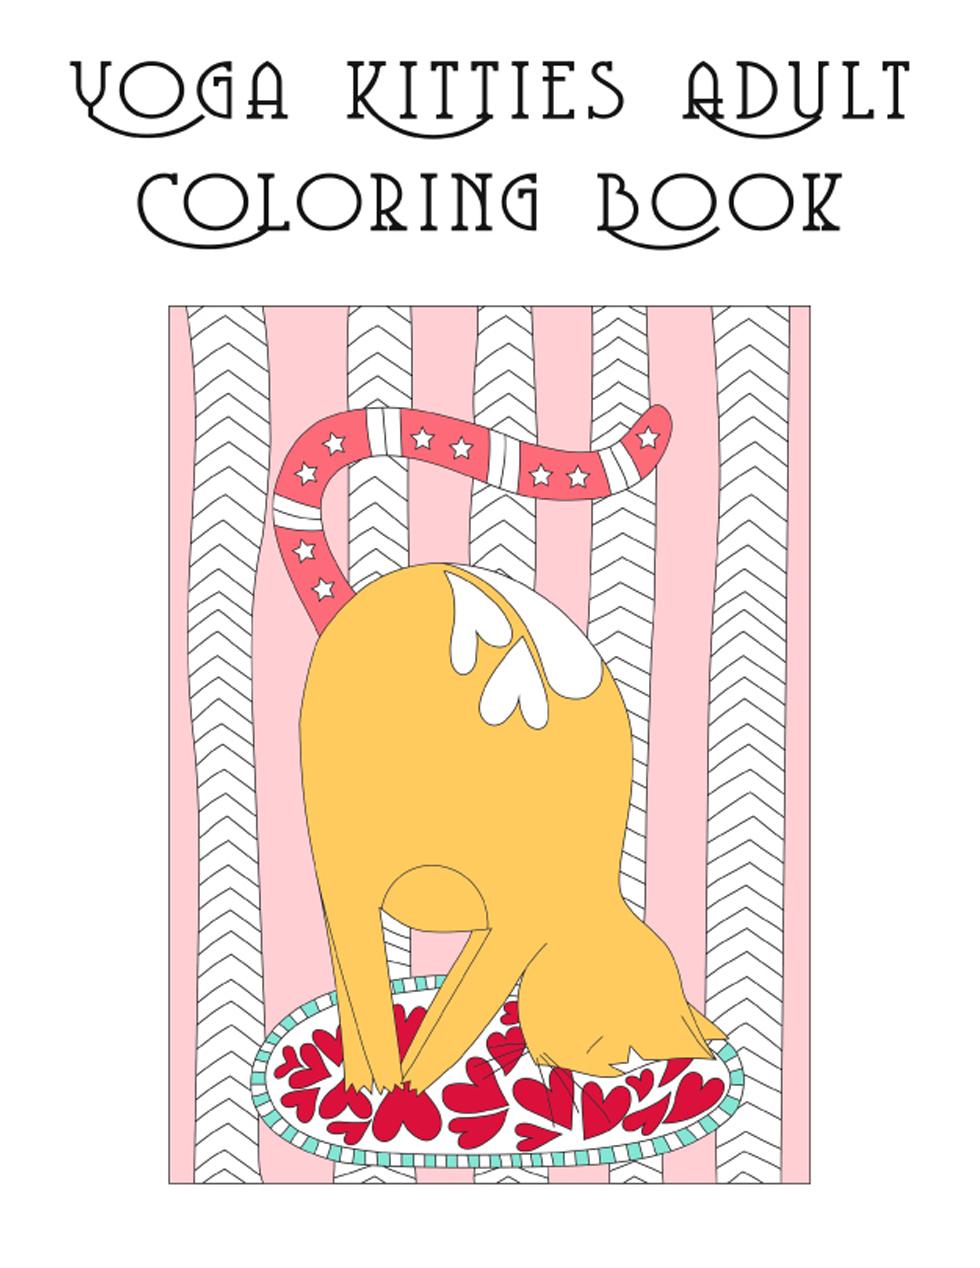 Yoga Kitties Adult Coloring Book